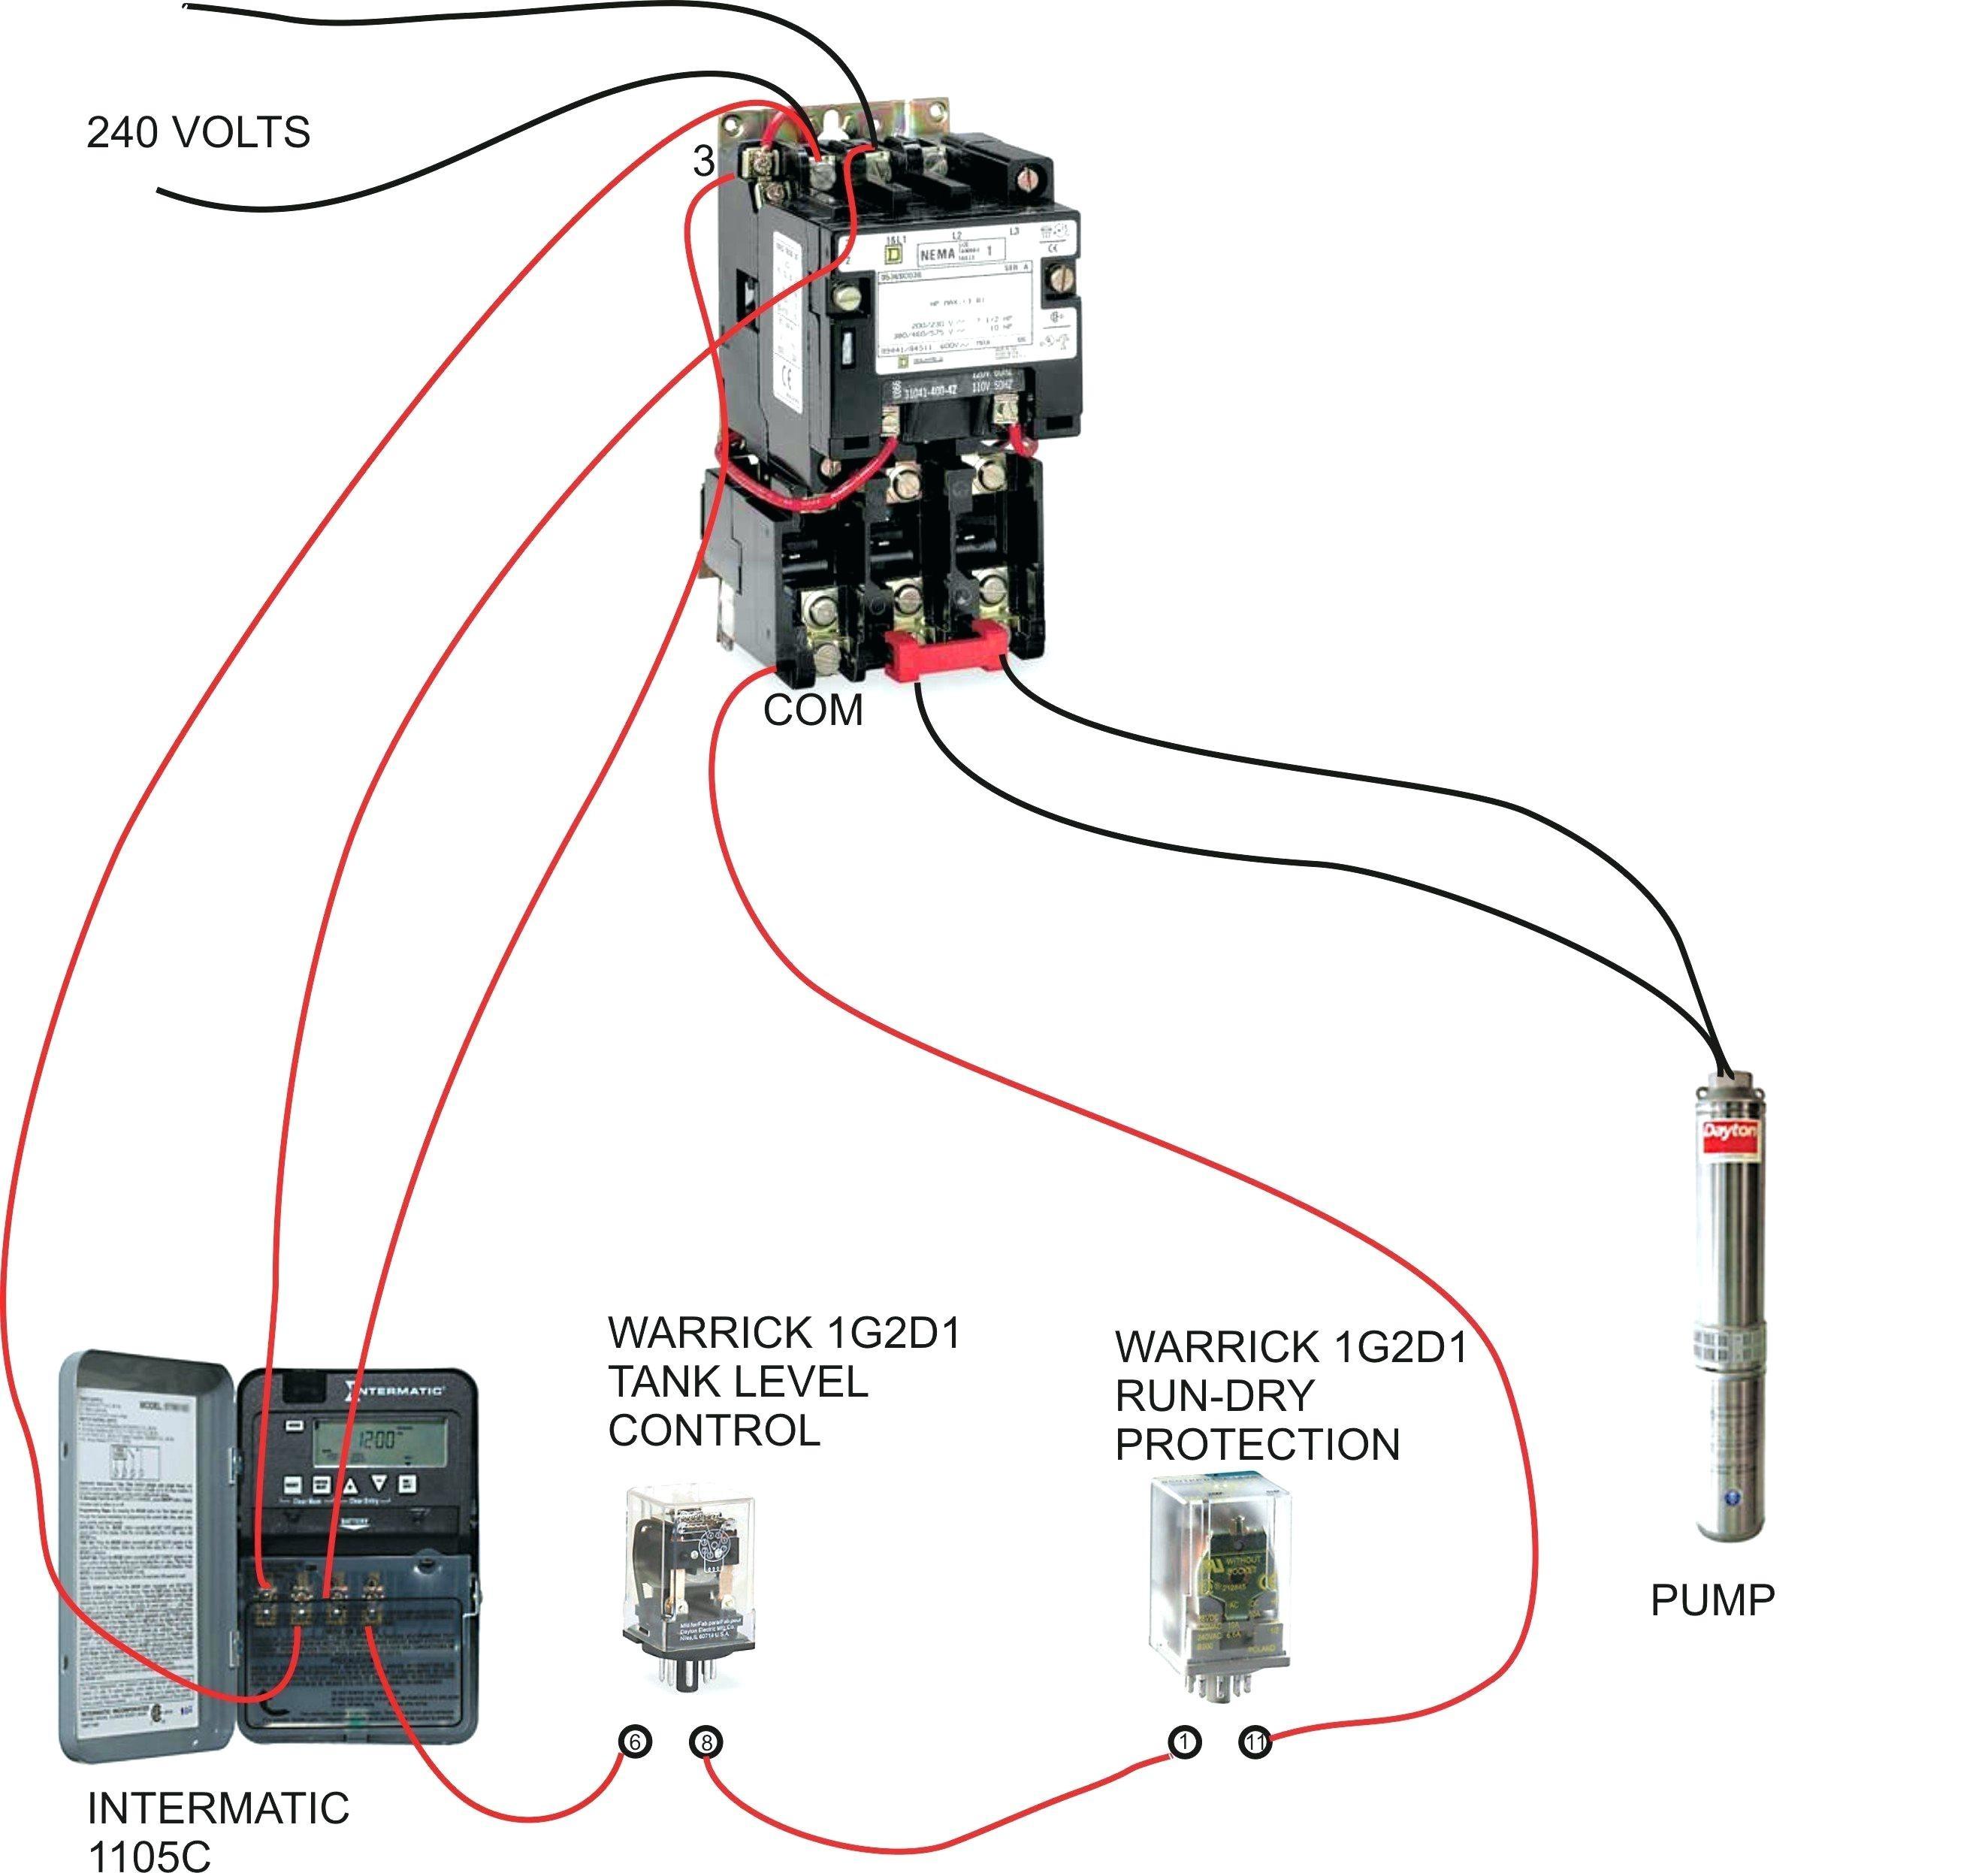 Intermatic Pool Timer Wiring Diagram | Wiring Diagram - Intermatic Pool Timer Wiring Diagram